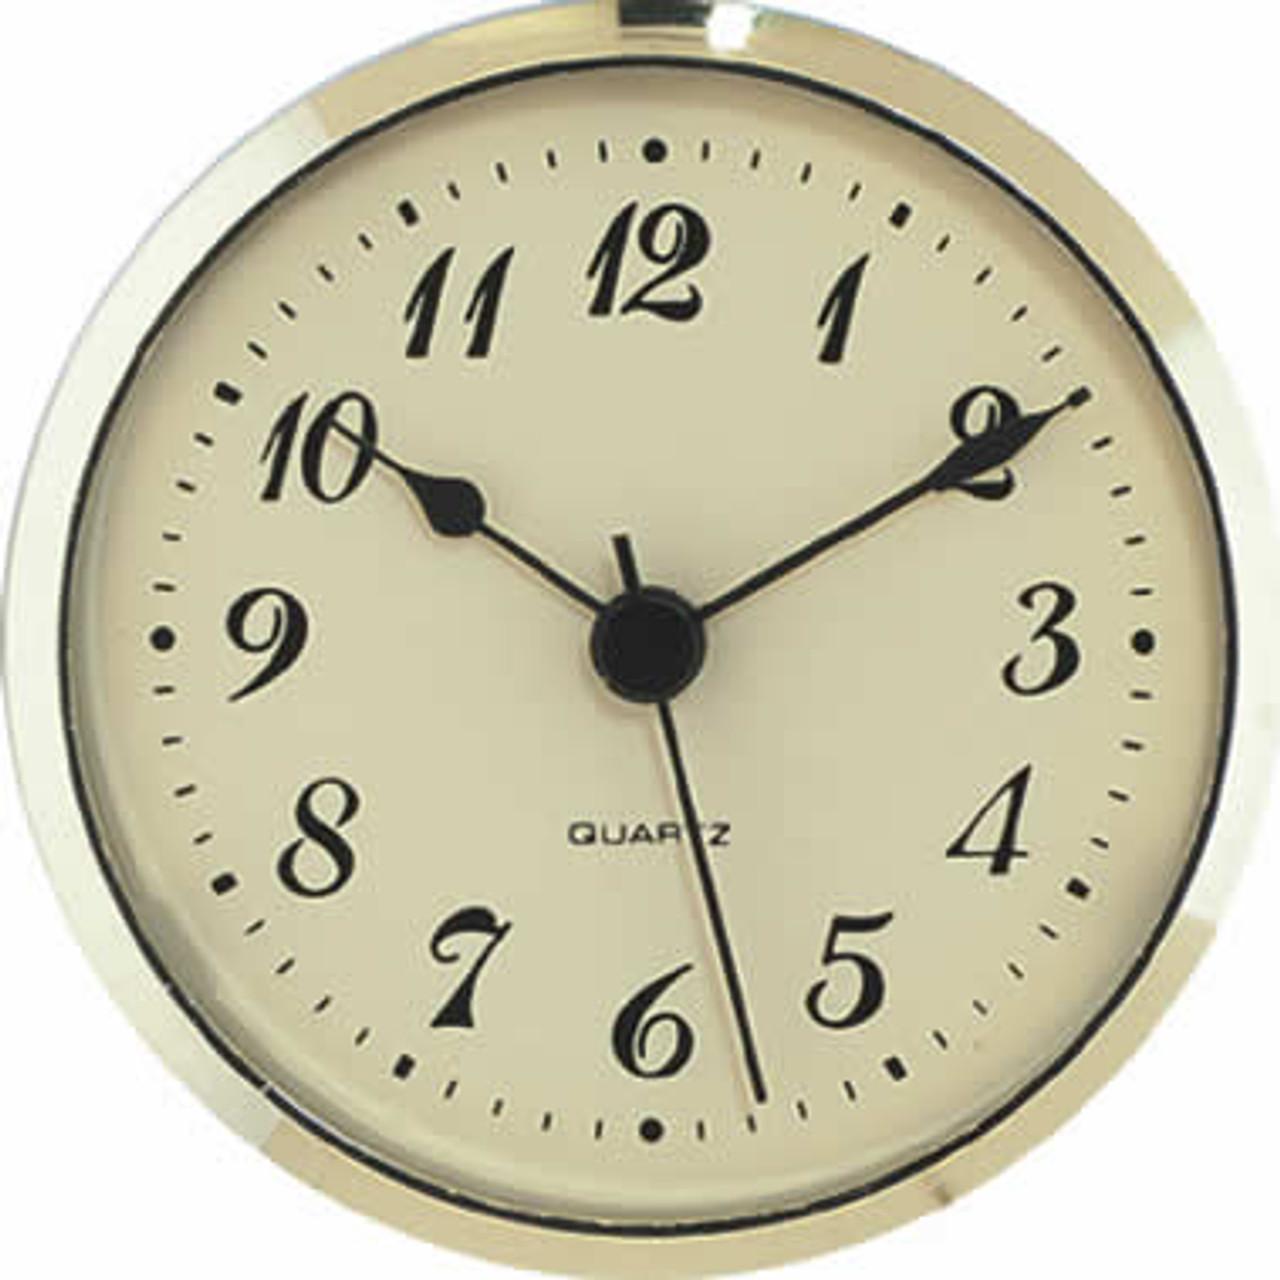 3-1/2 (90mm) Arabic Gold Face Clock Insert/Fit Up